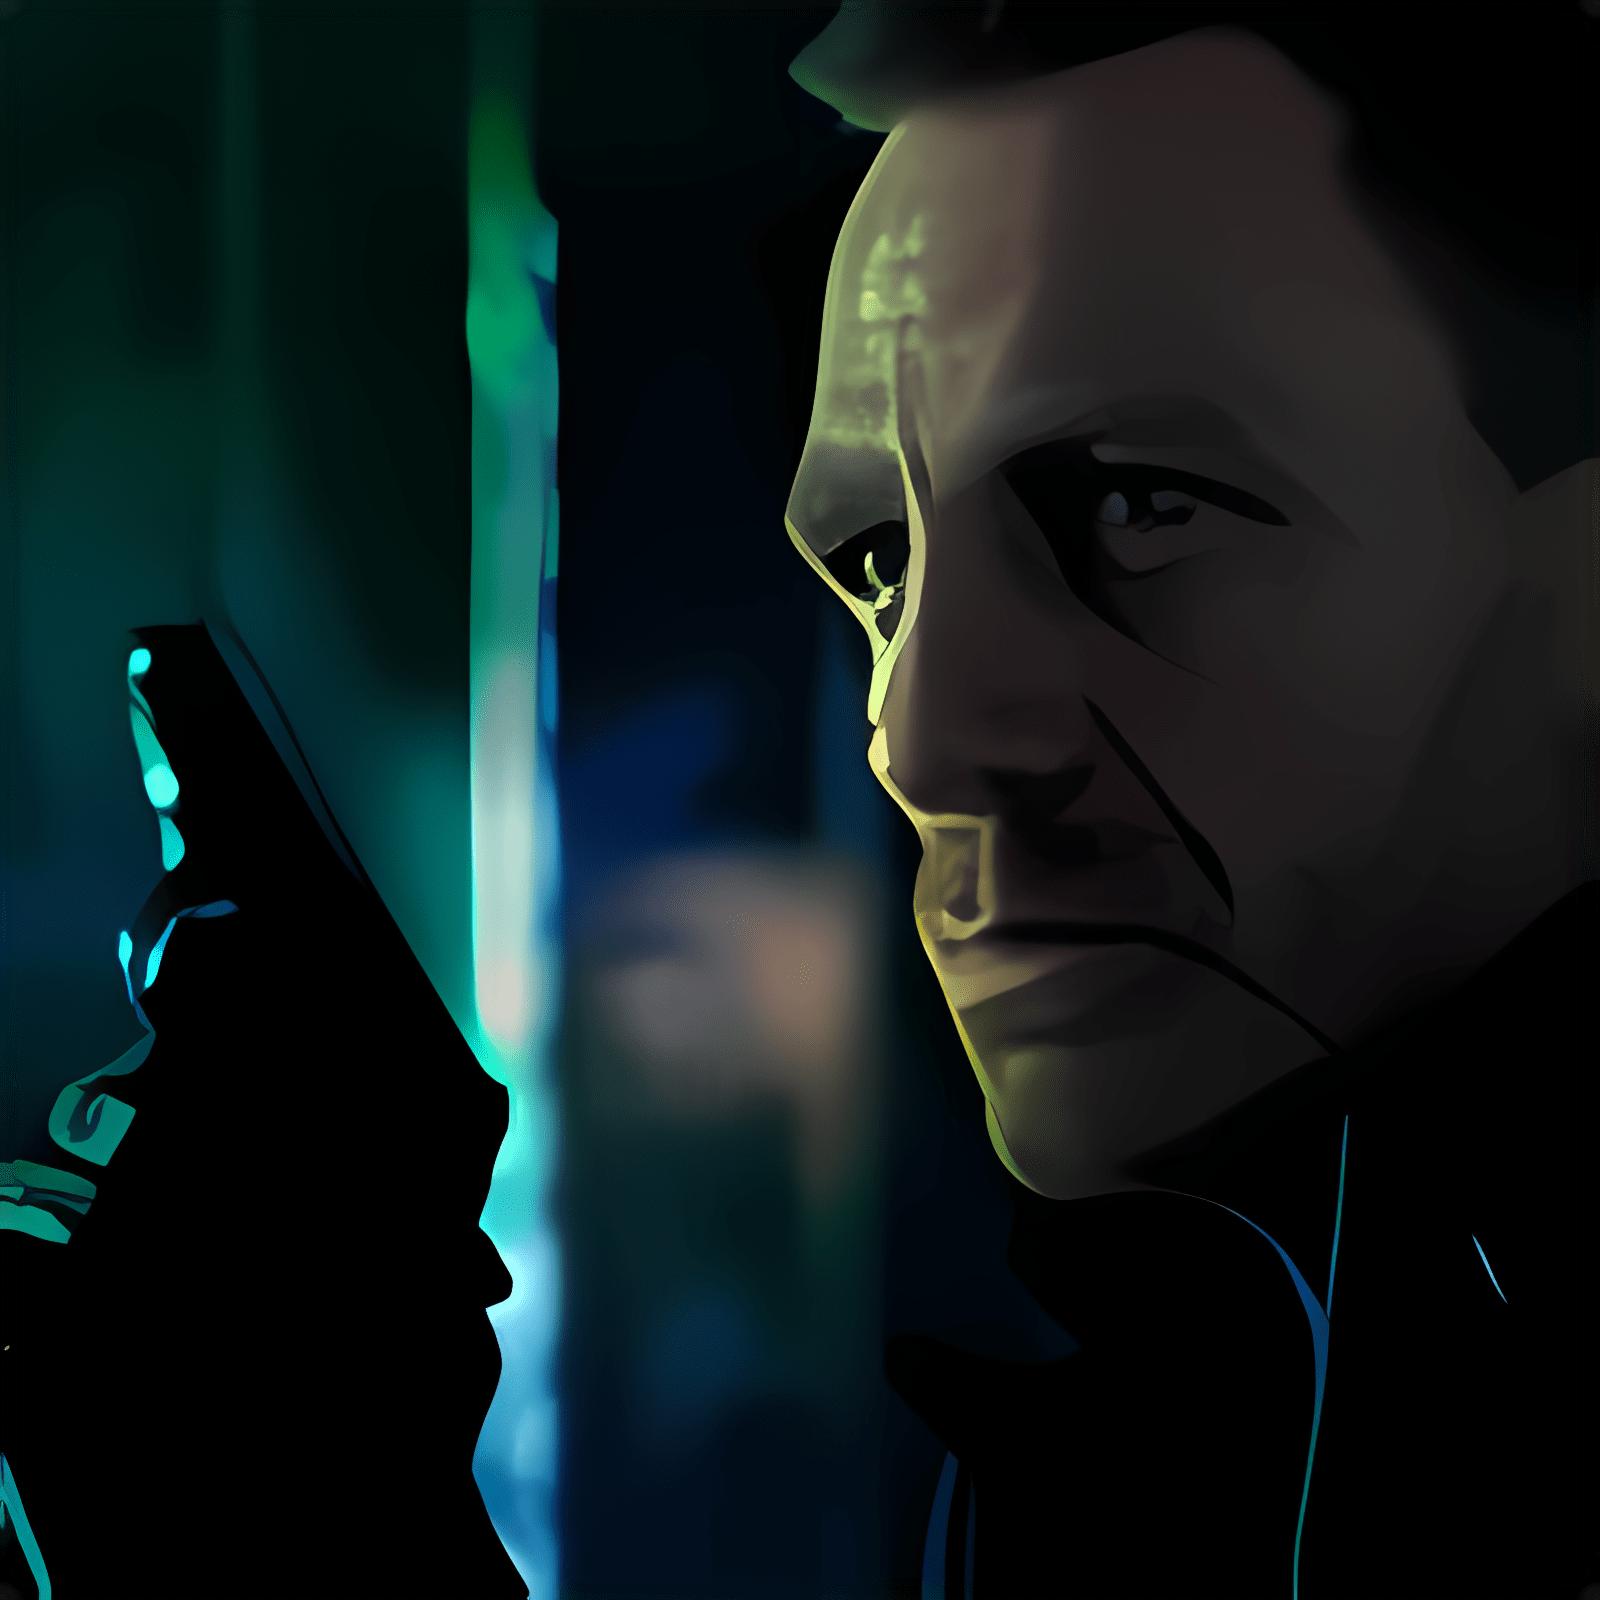 James Bond: Skyfall Wallpaper